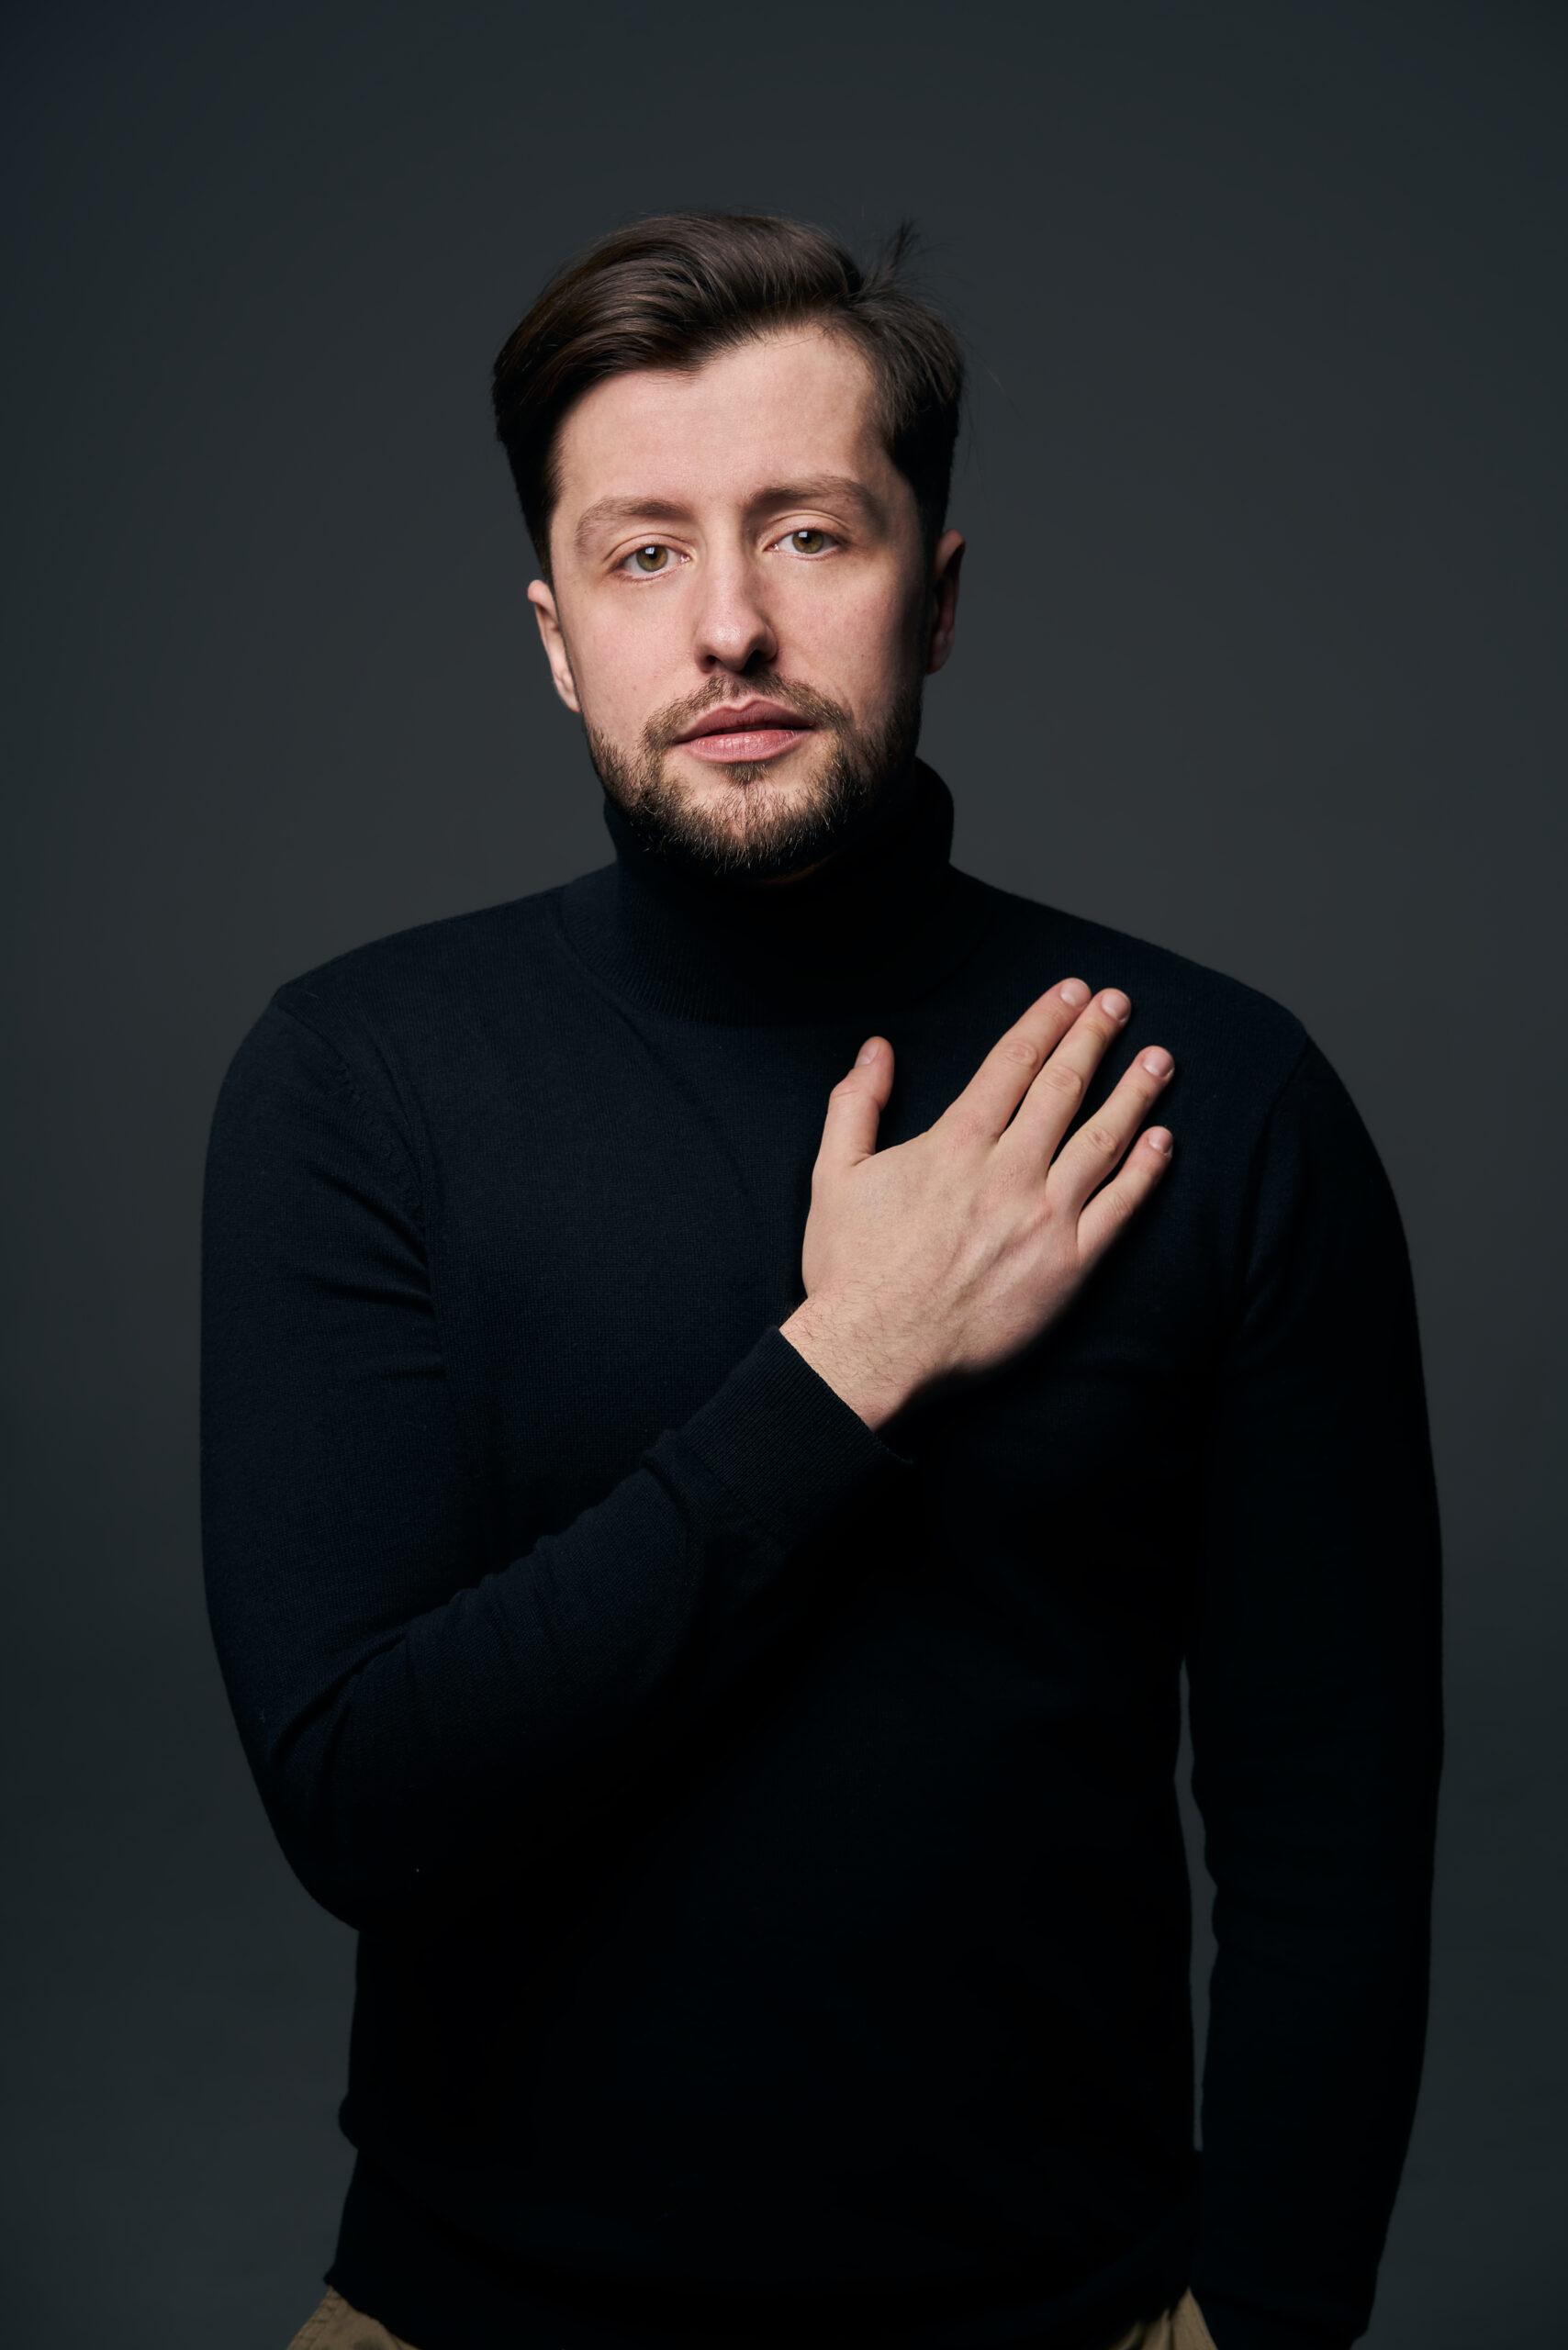 Fot. Mateusz Ciągło